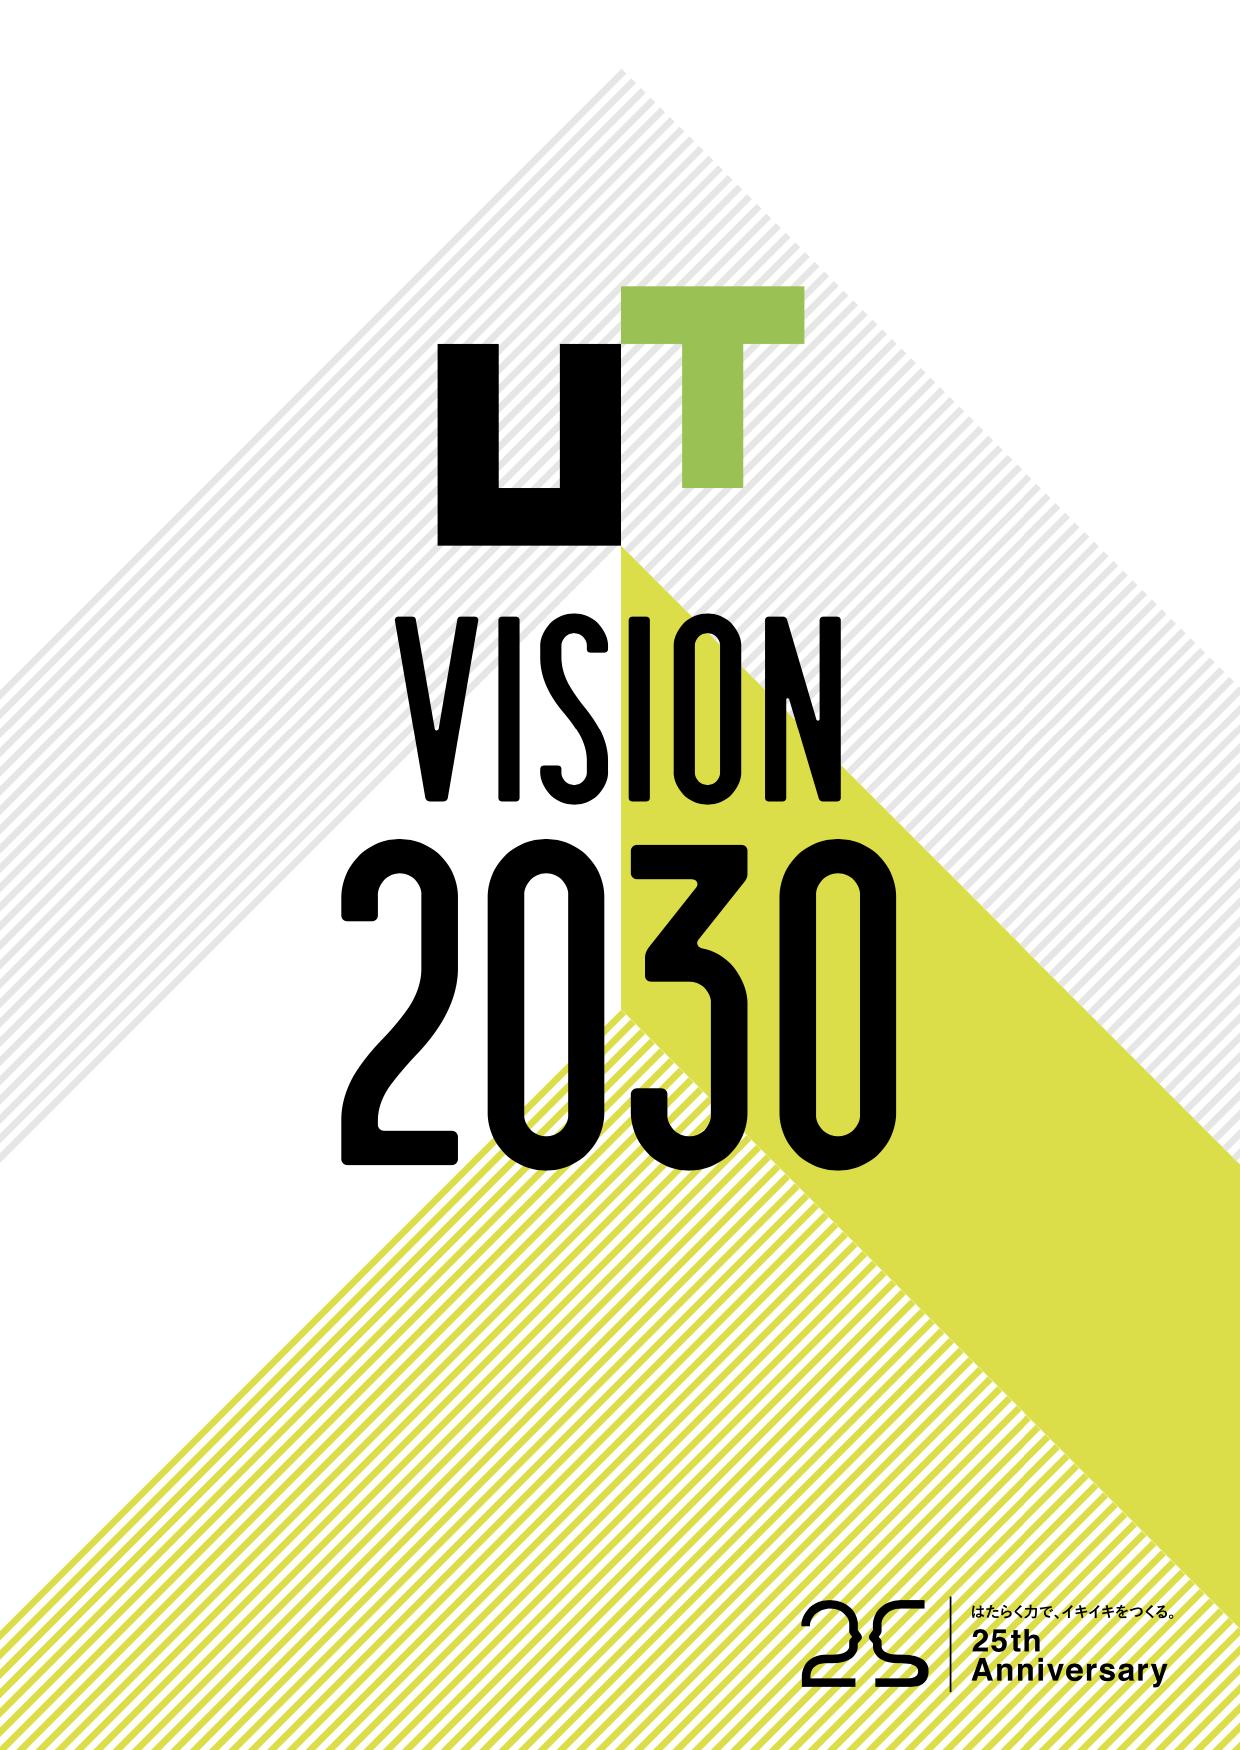 UT VISION 2030